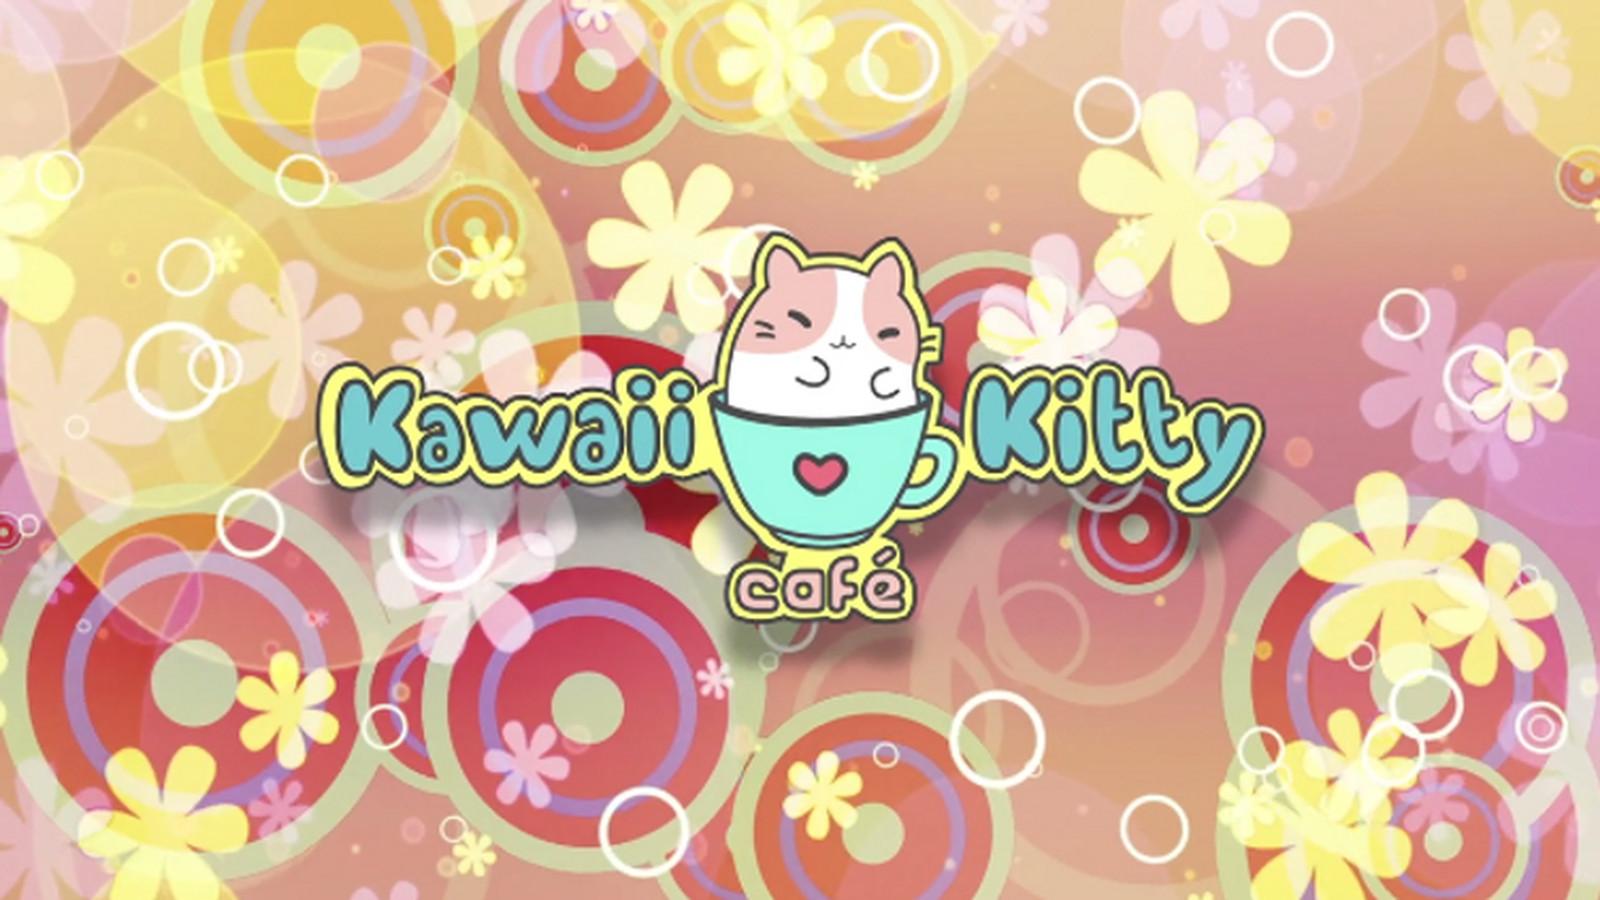 Philly Kawaii Kitty Cafe Menu